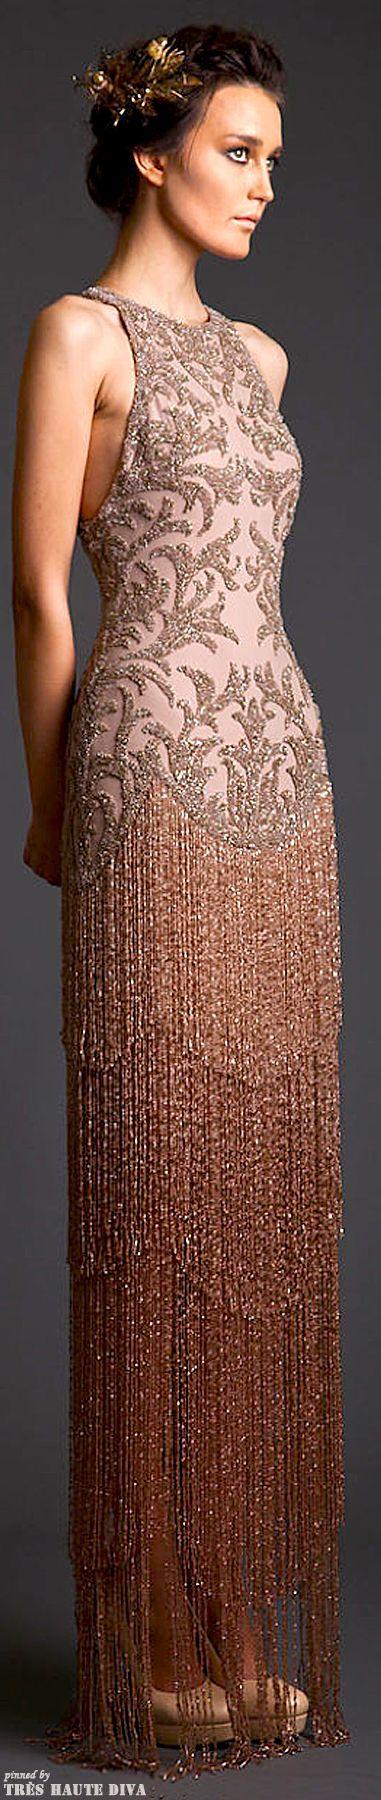 #Krikor Jabotian Couture S/S 2014: